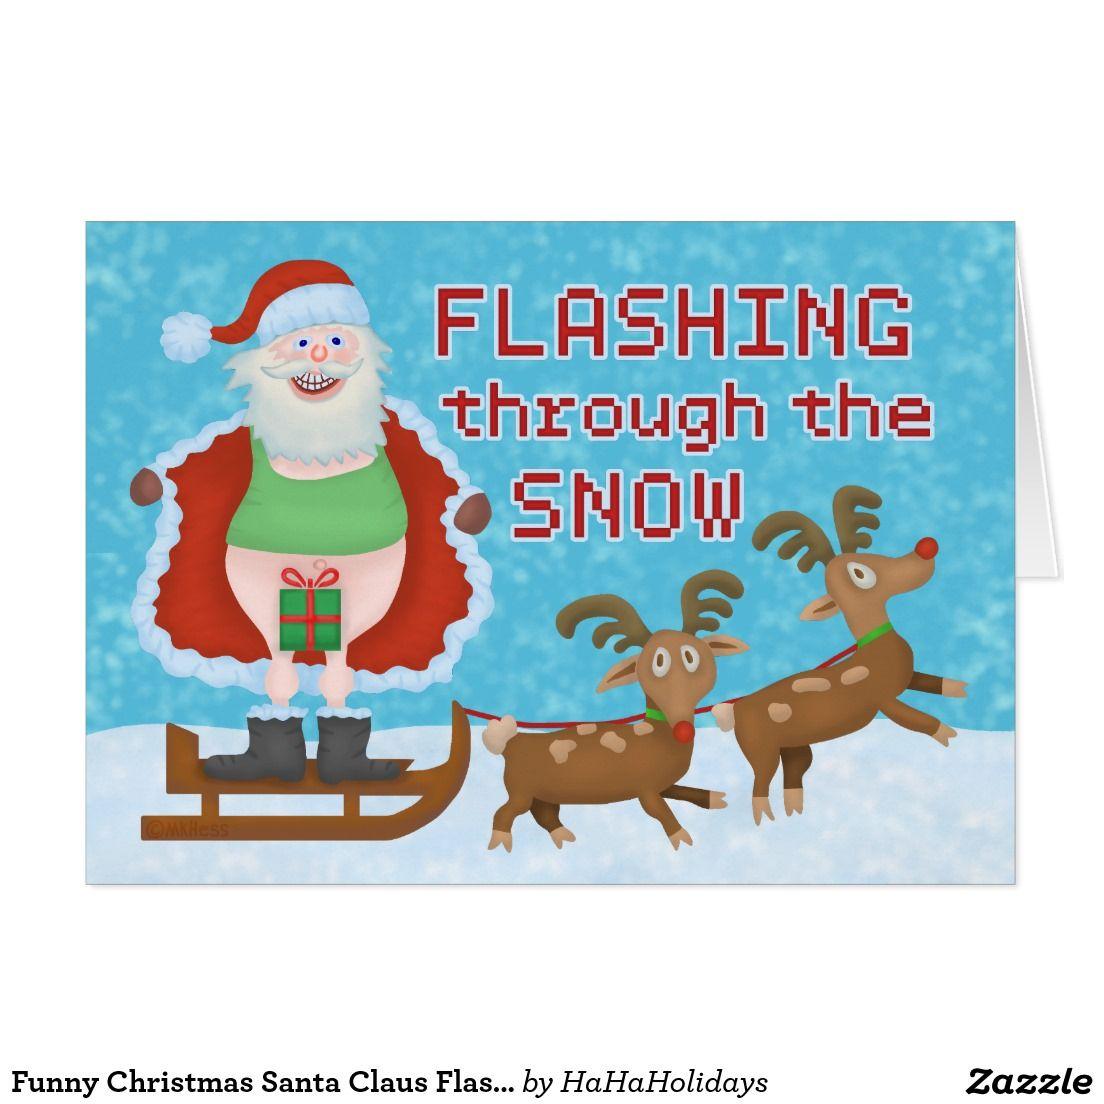 Funny christmas santa claus flashing through the snow holiday funny christmas santa claus flashing through the snow holiday greeting card zazzle kristyandbryce Gallery